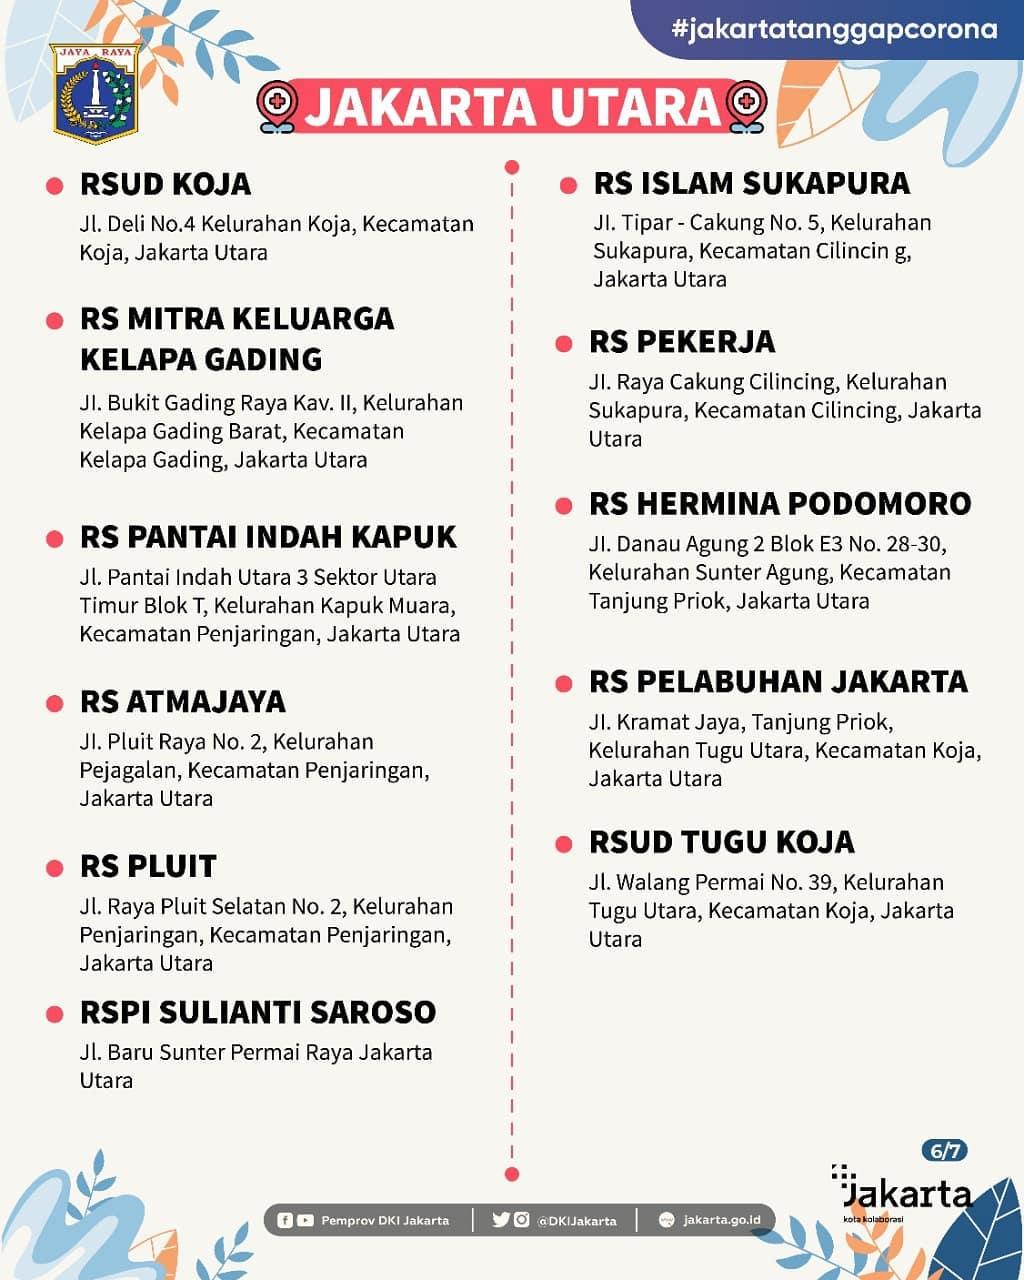 DAFTAR RUMAH SAKIT RUJUKAN PENANGGULANGAN COVID-19 DI PROVINSI DKI JAKARTA-SLIDE-6